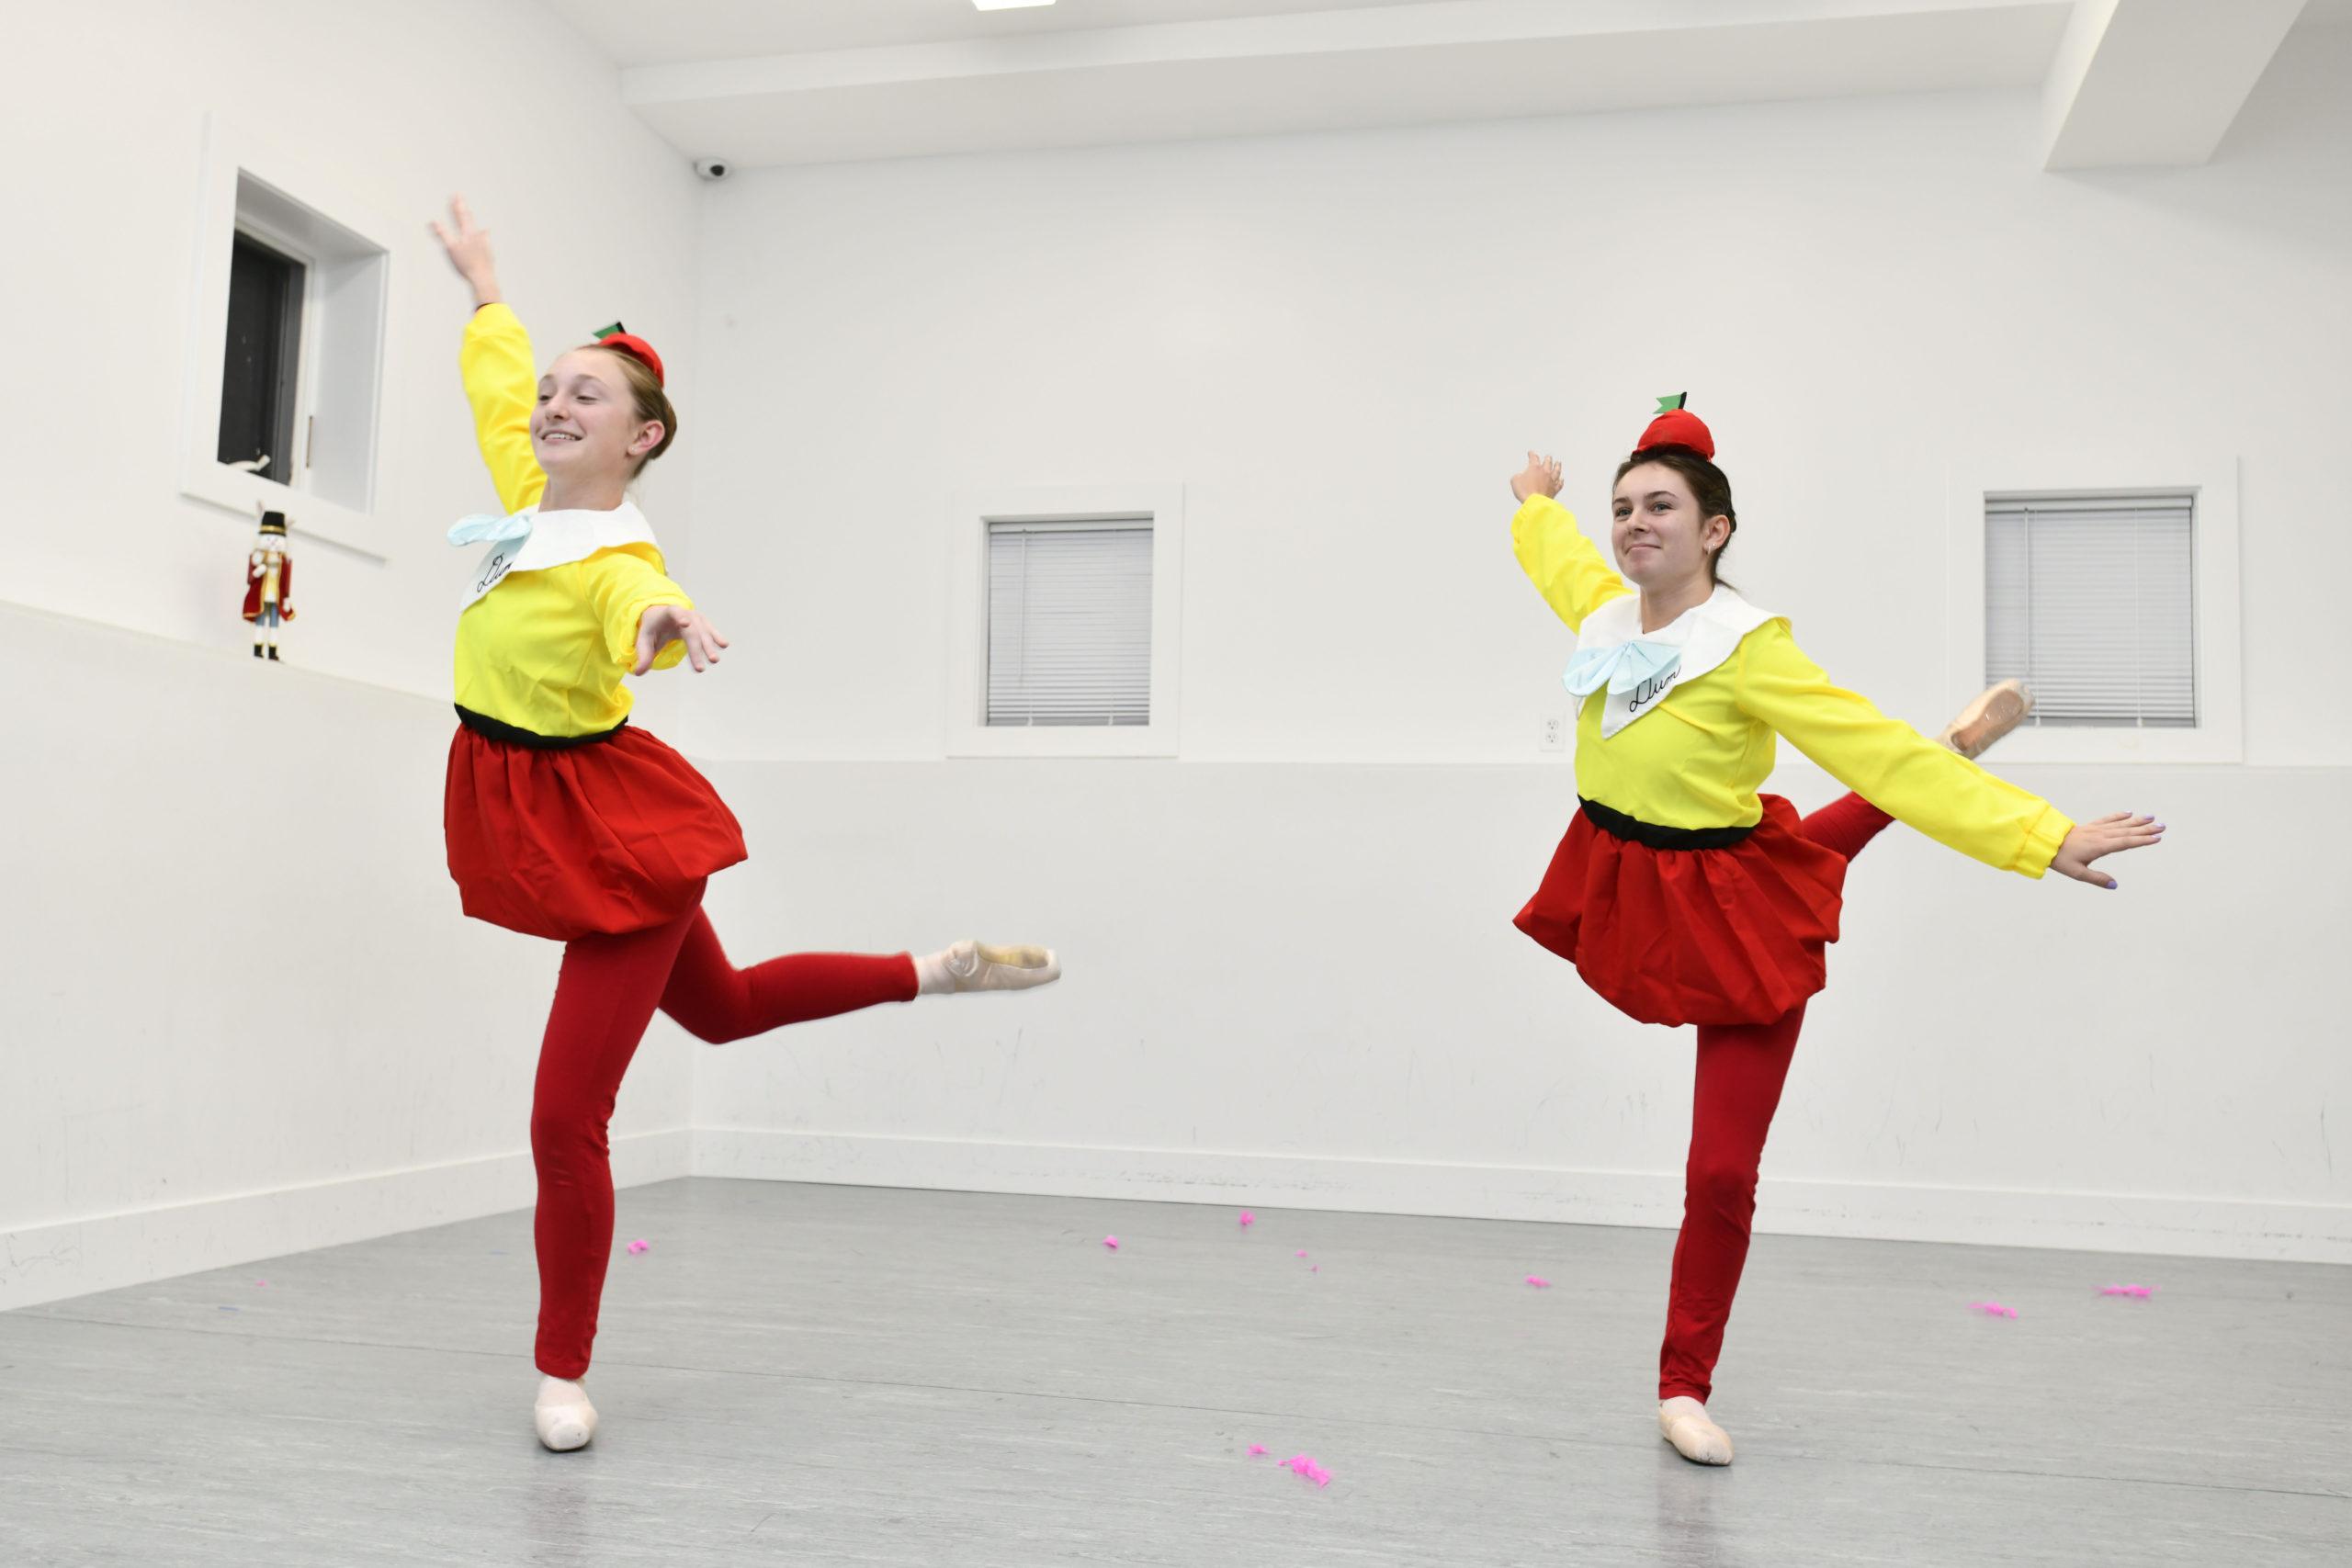 Jacqueline Gluck and Brooke Bierfriend as Tweedle Dum and Tweedle Dee during rehearsal Studio 3 production,